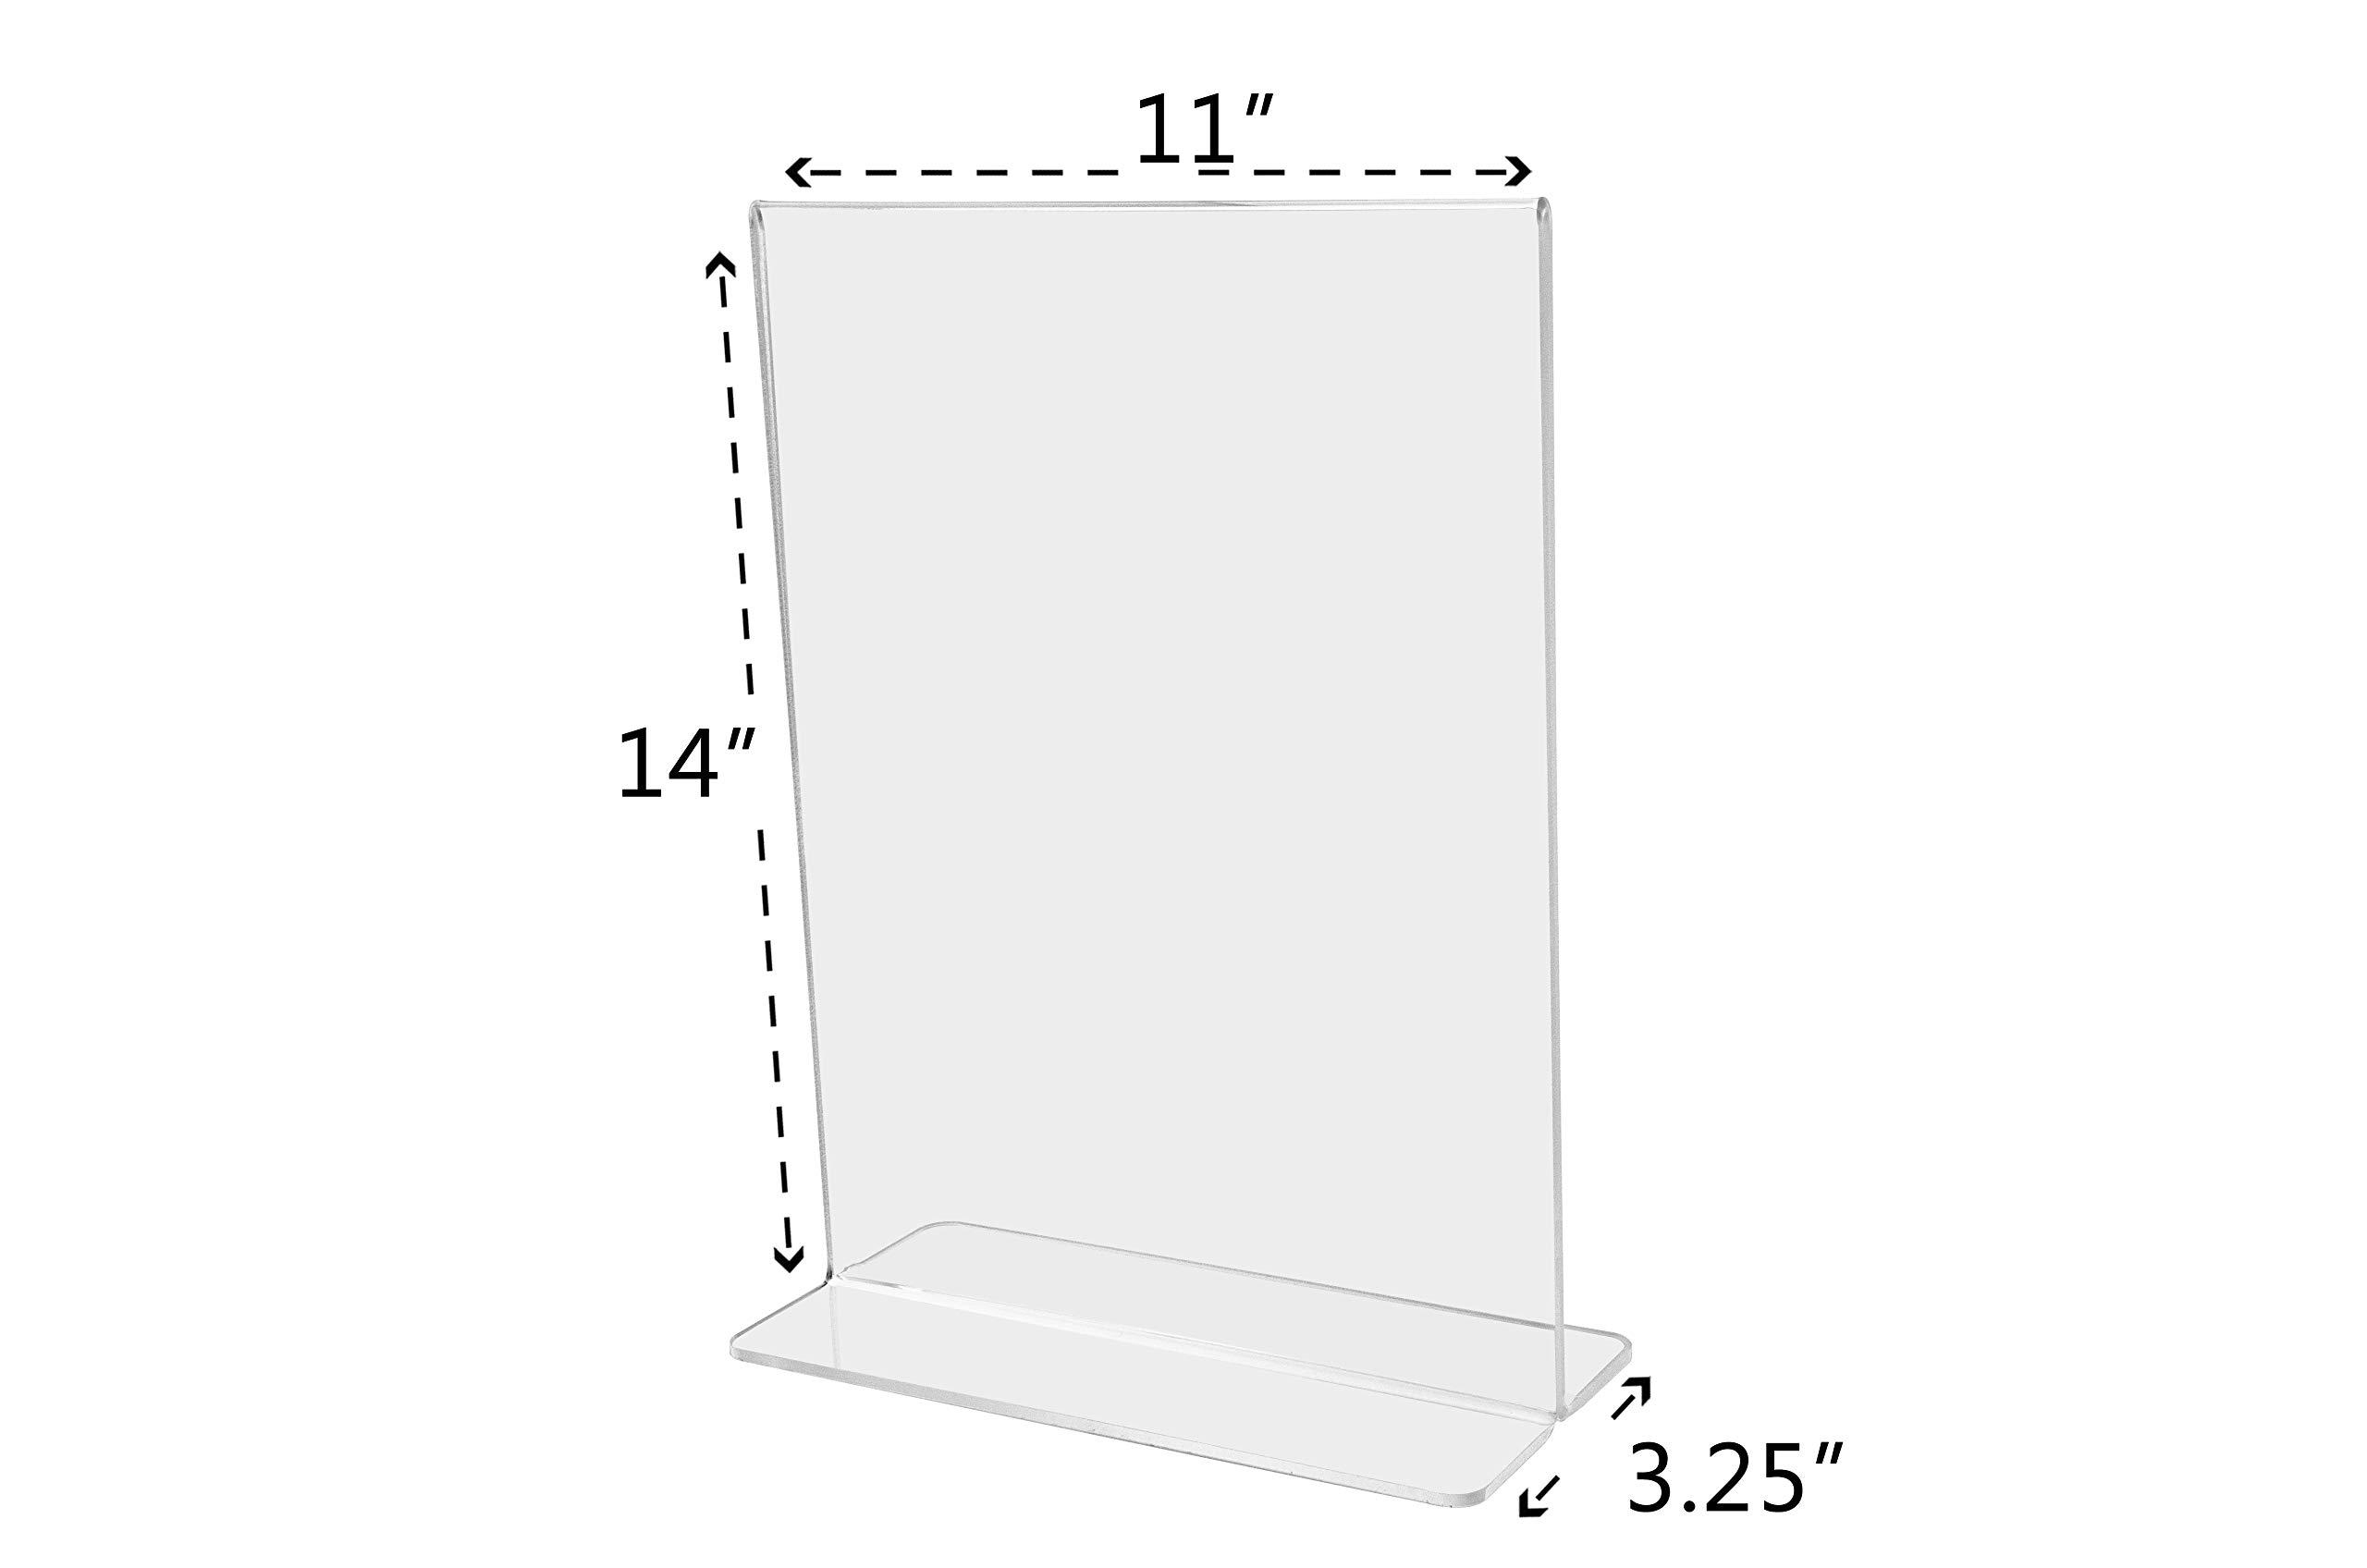 Marketing Holders Sign Holder Literture Flyer Display Stand Bottom Load Frames 11''w x 14''h Pack of 10 by Marketing Holders (Image #6)